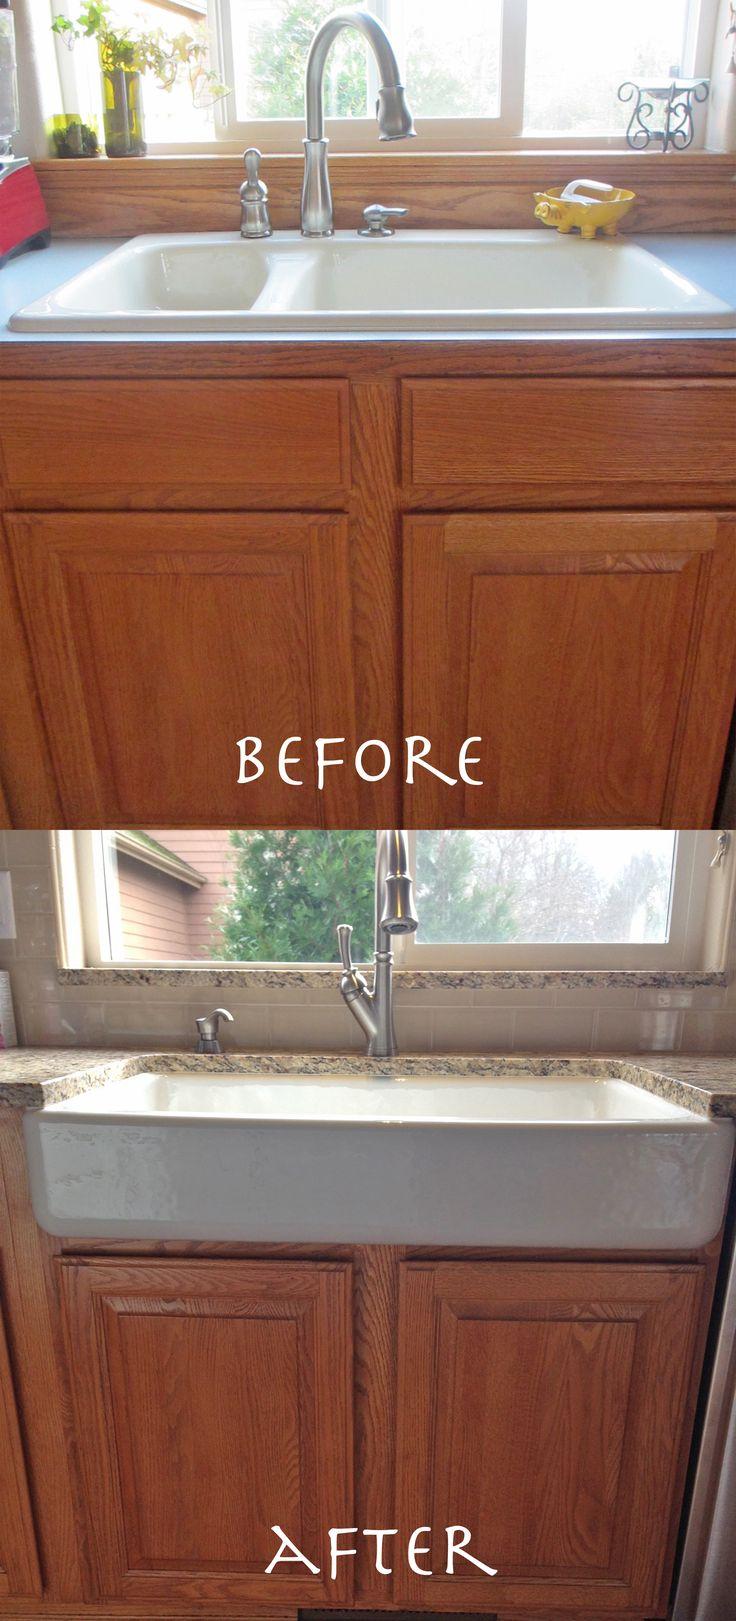 Apron Front Sink Retrofit A Standard Cabinet Kohler Whitehaven Self Trimming Sink Apron